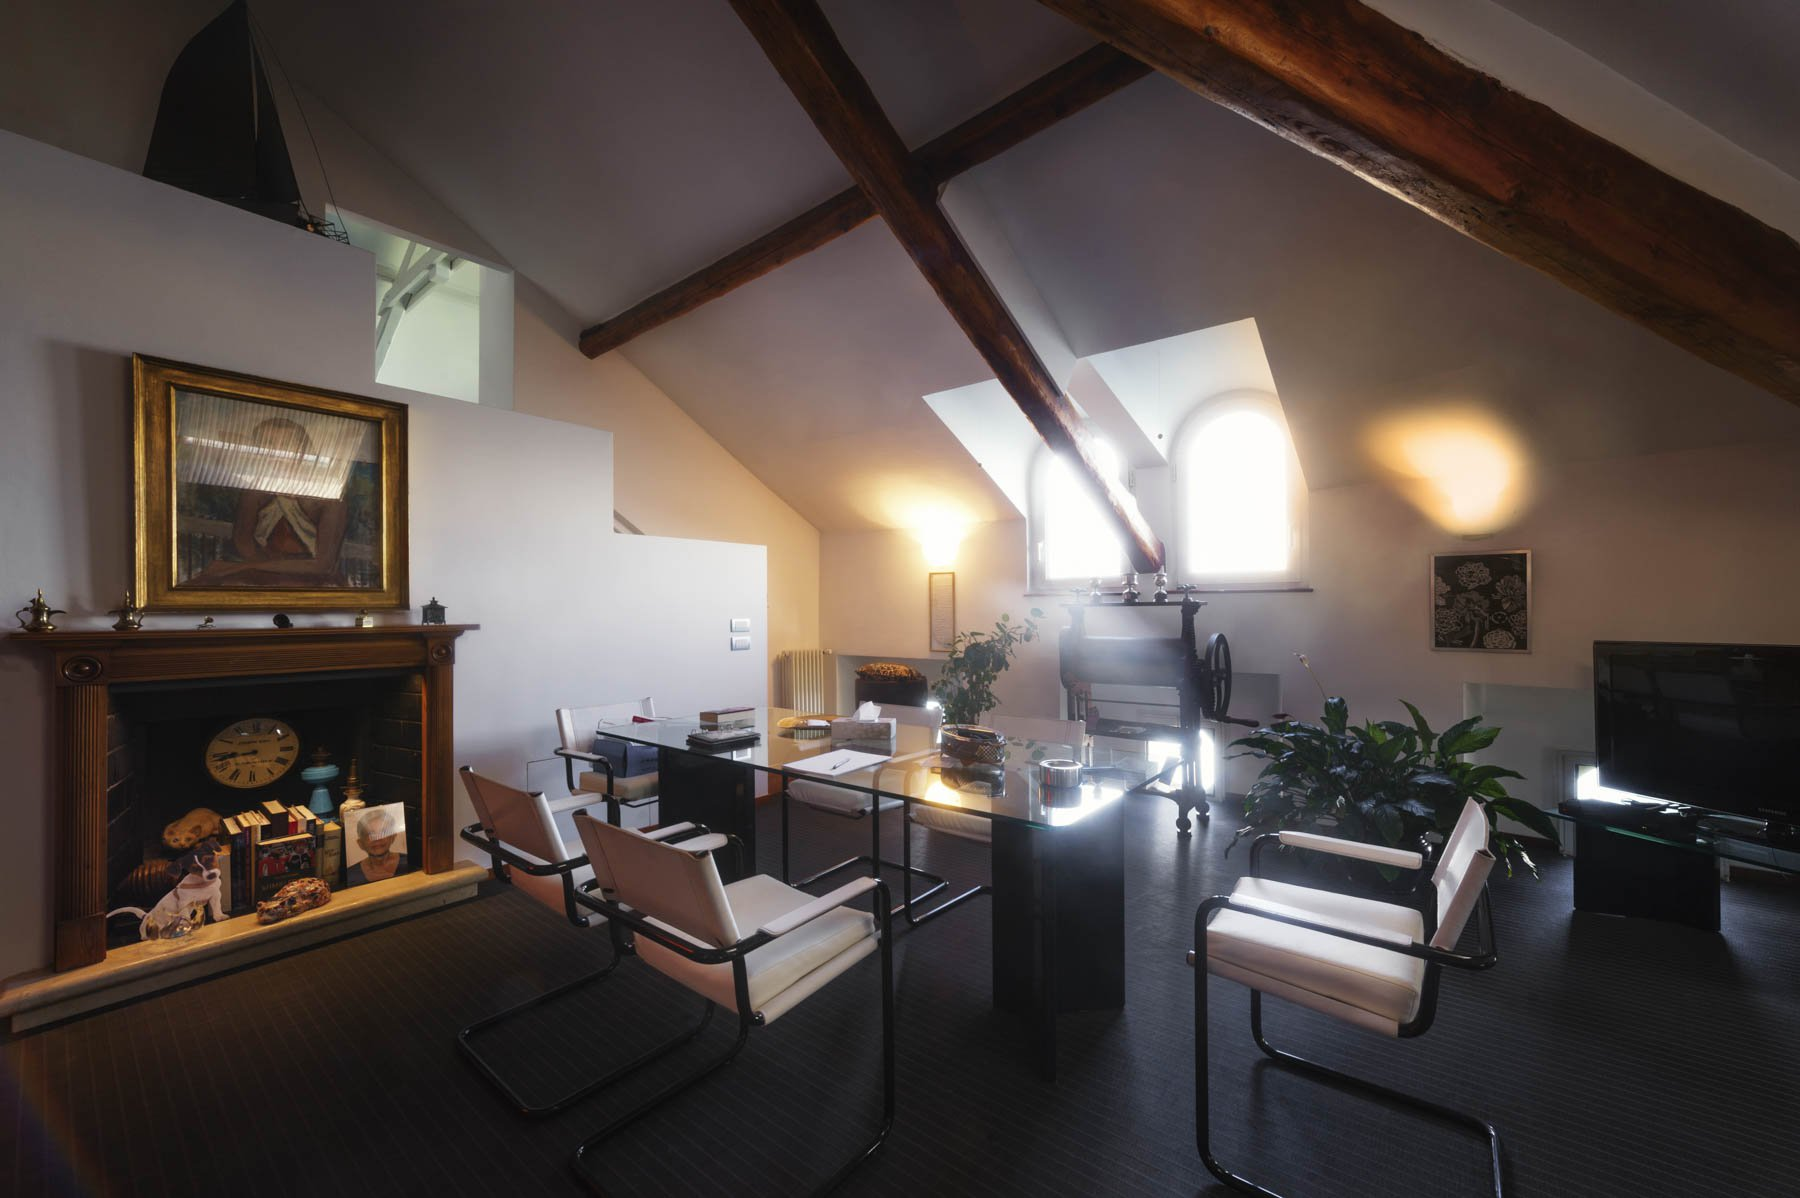 Apartment for sale in Baveno, inside a historic lake front villa - study